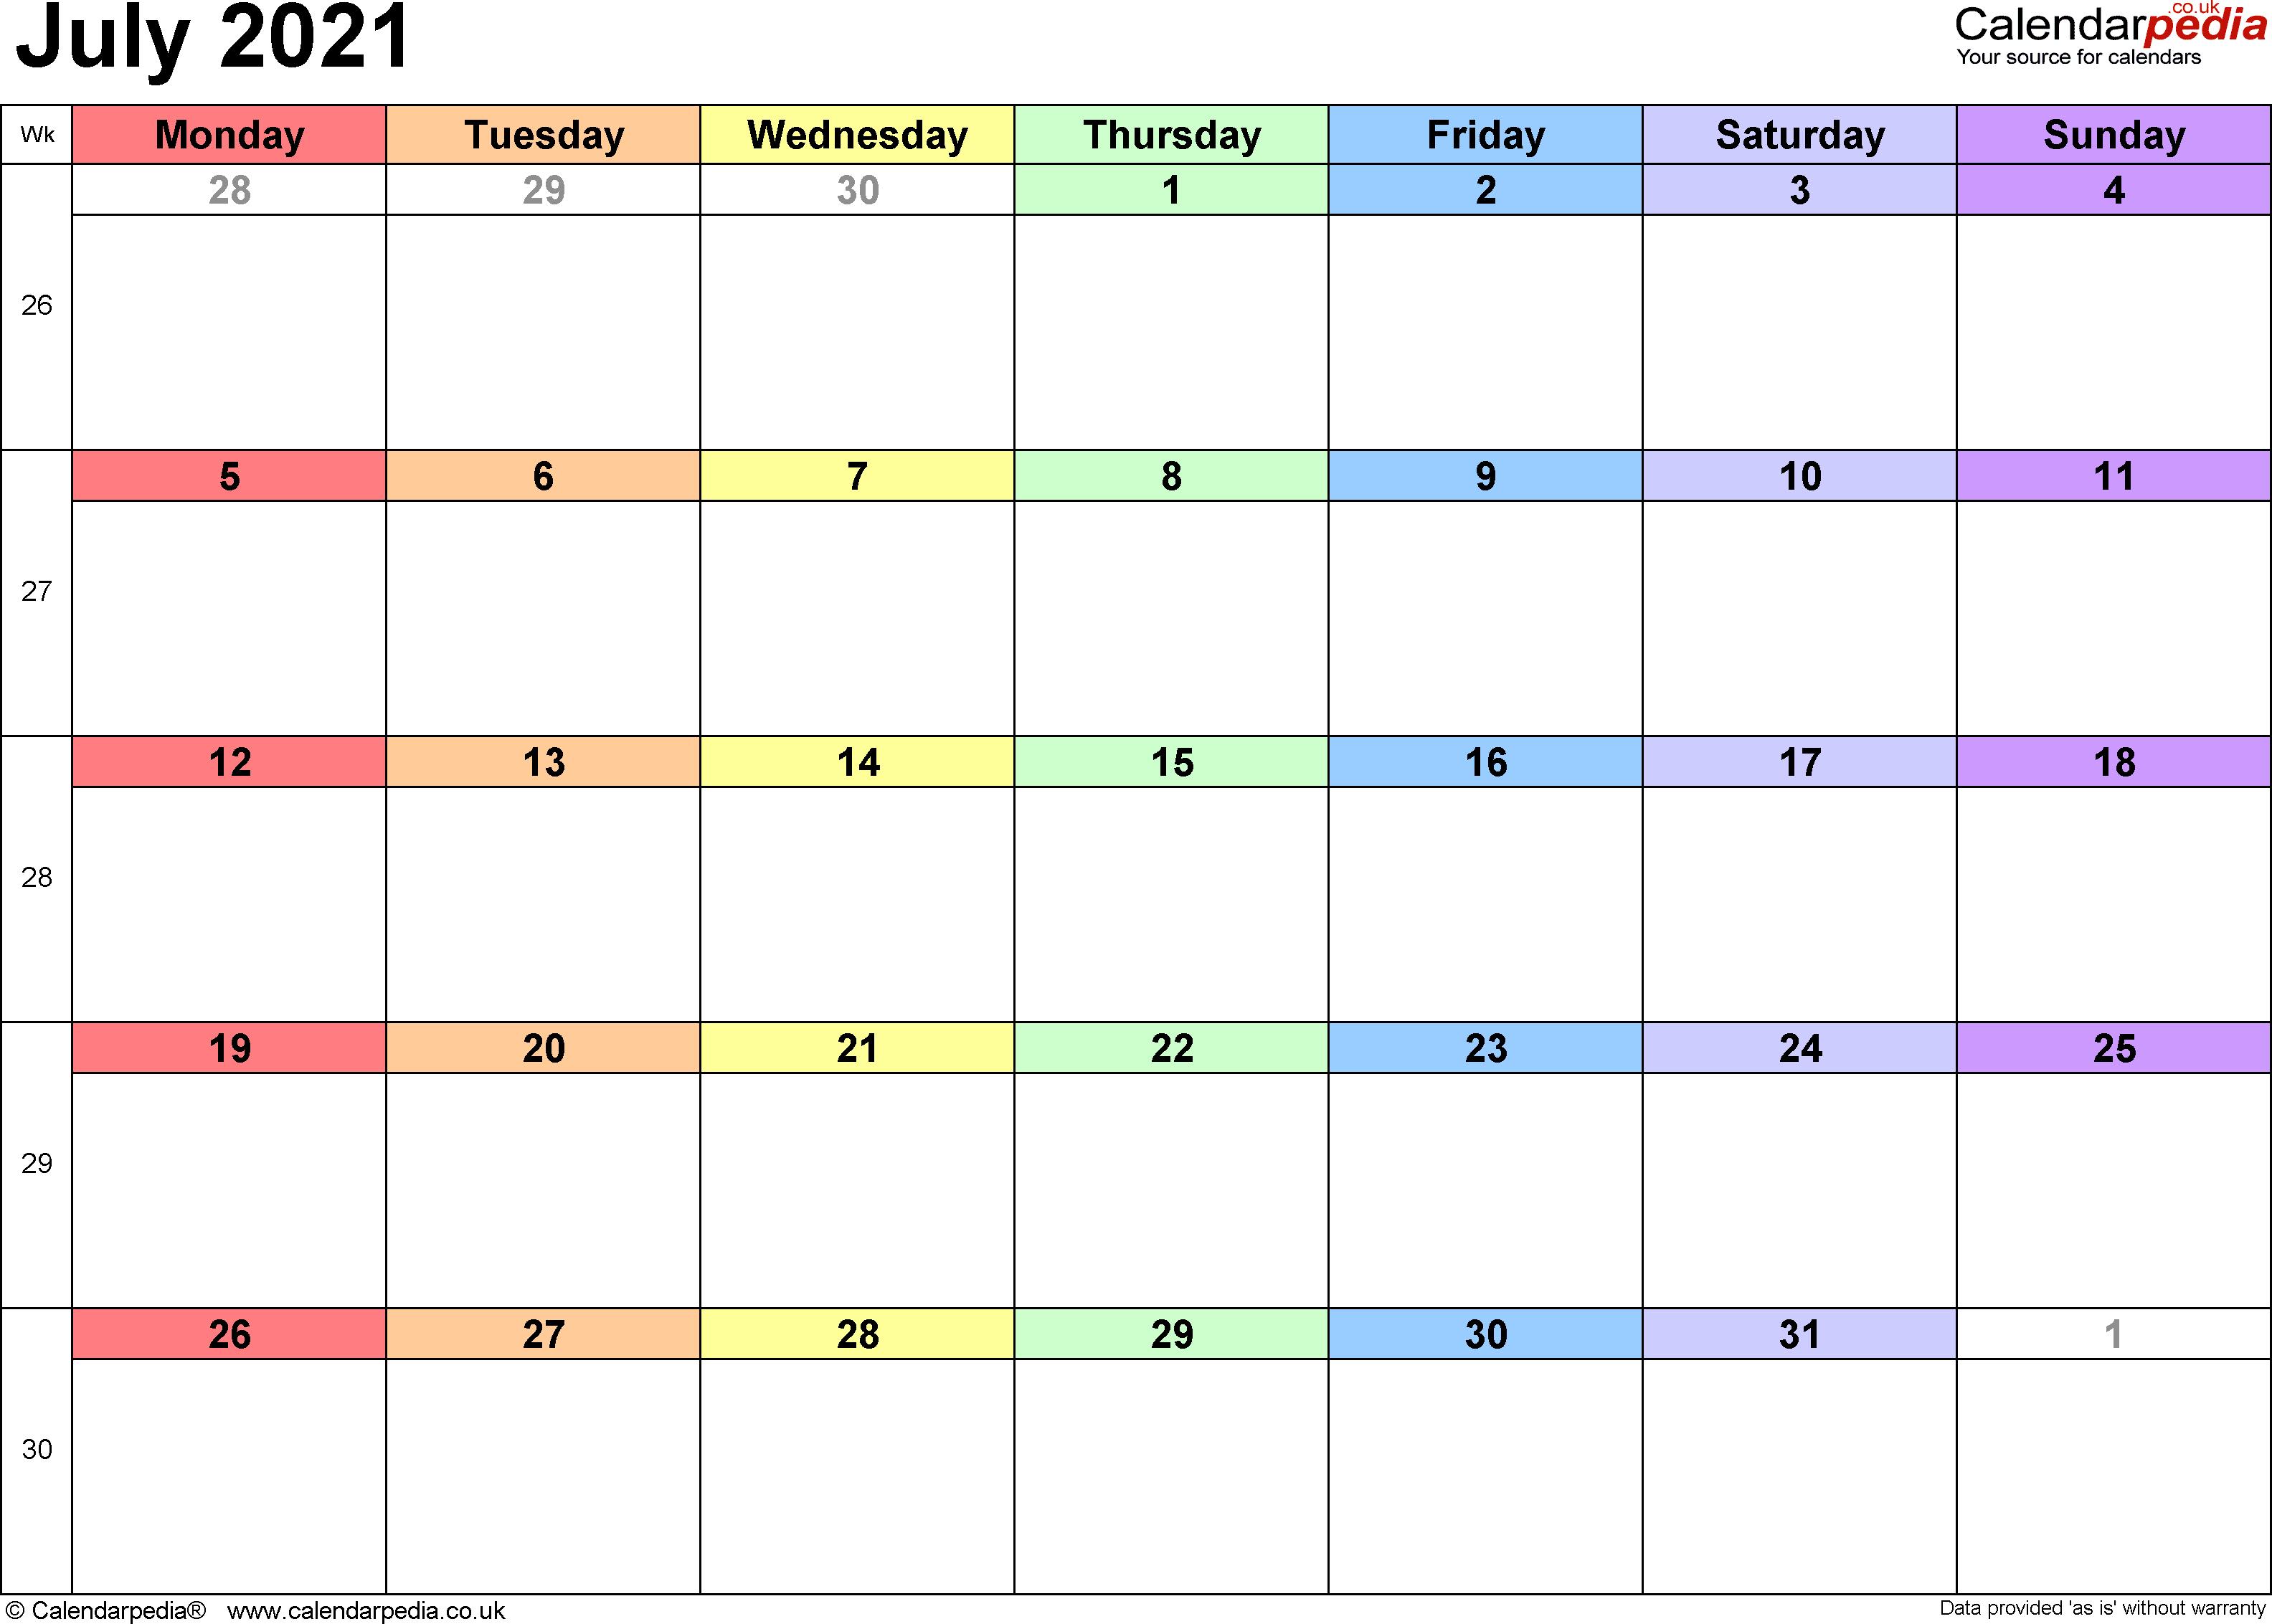 Calendar July 2021 UK, Bank Holidays, Excel/PDF/Word Templates